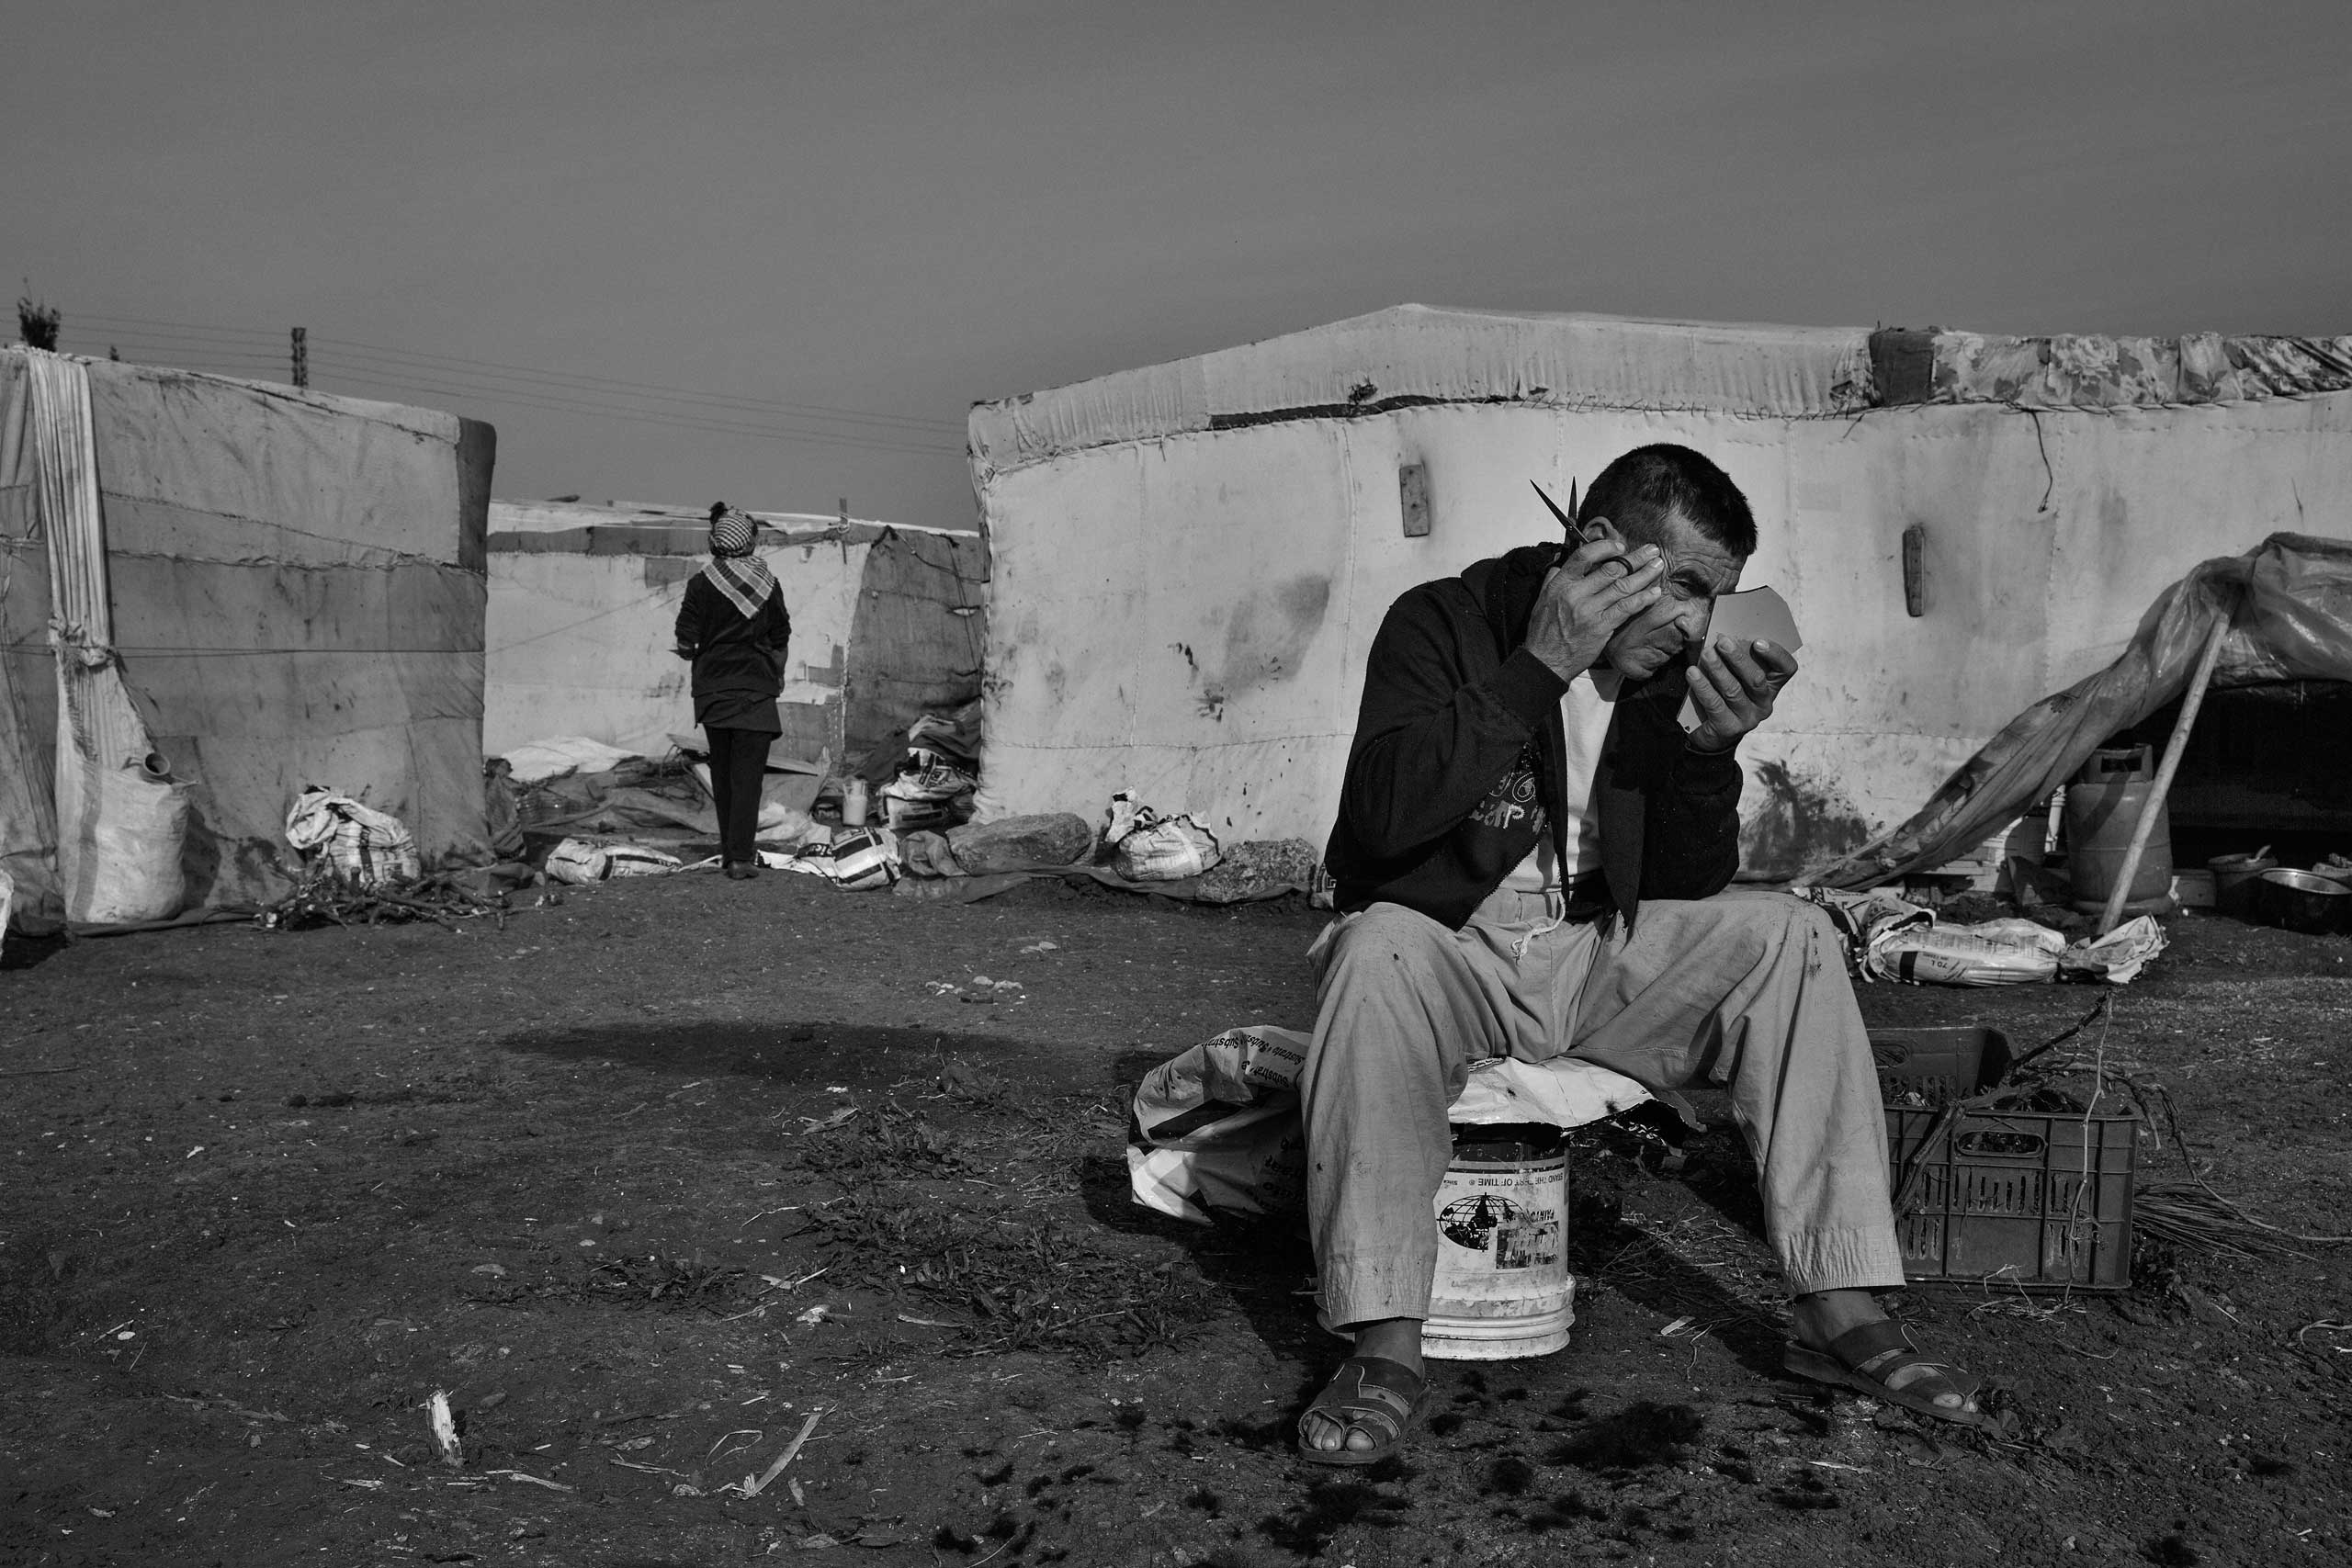 January 2014. Northern Lebanon, near the Syrian border. Syrian refugees in Lebanon's informal settlements.